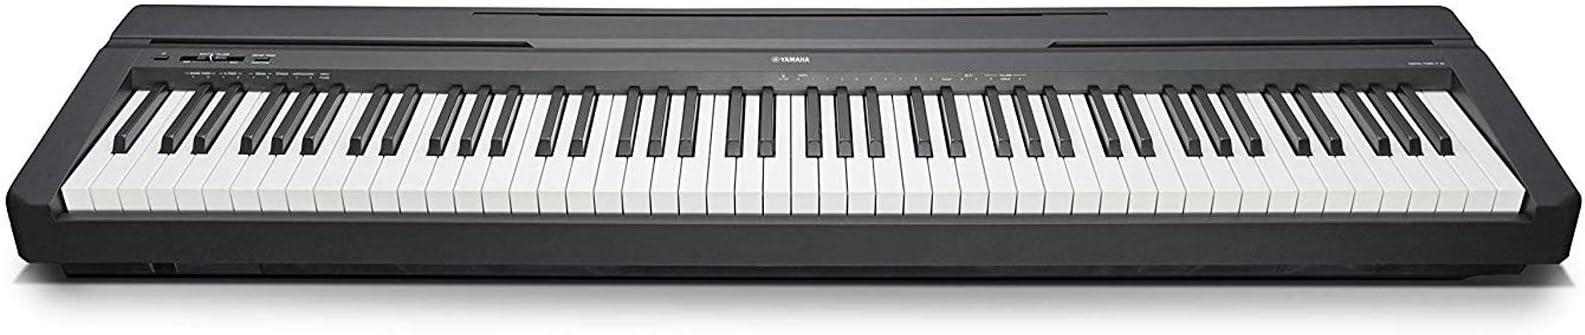 Piano digital Yamaha P45, pack completo de Piano digital ...